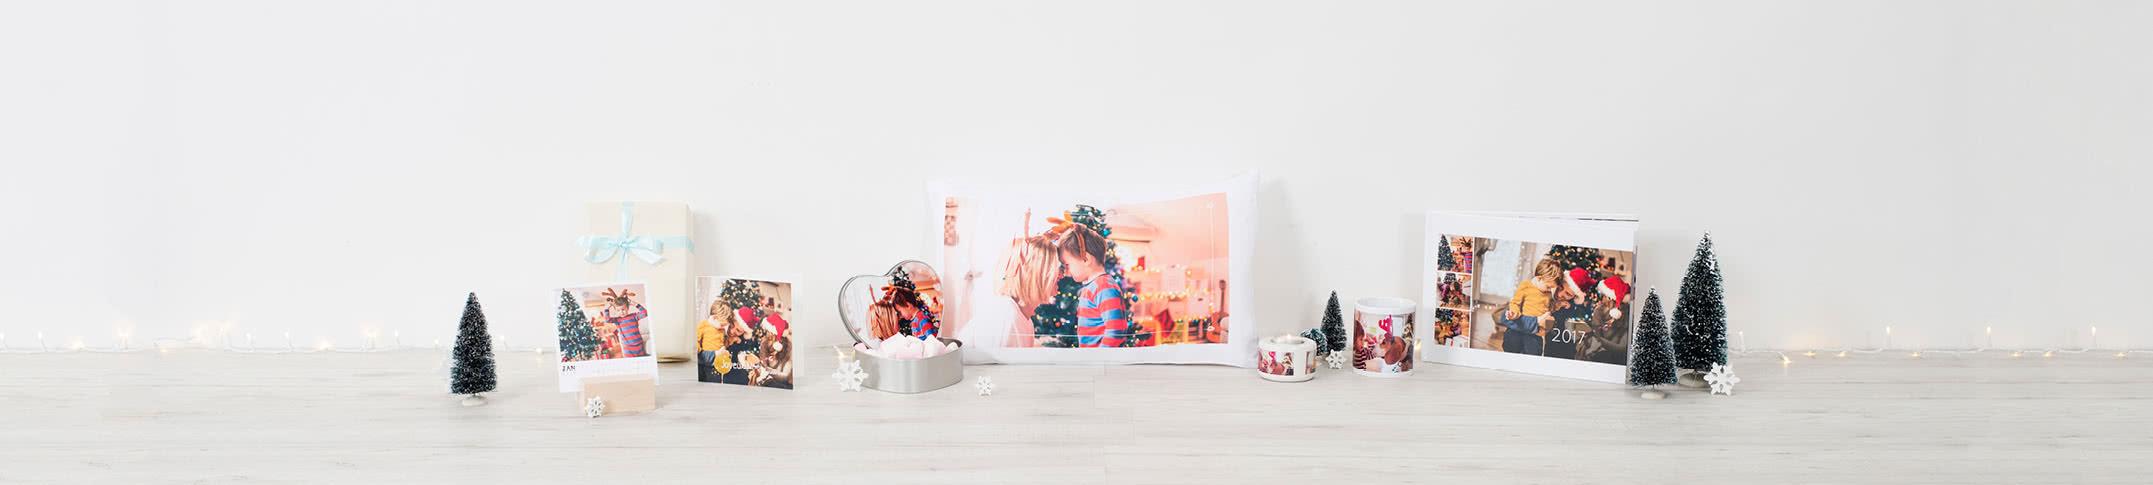 noel 2017 id e cadeau noel d coration noel. Black Bedroom Furniture Sets. Home Design Ideas